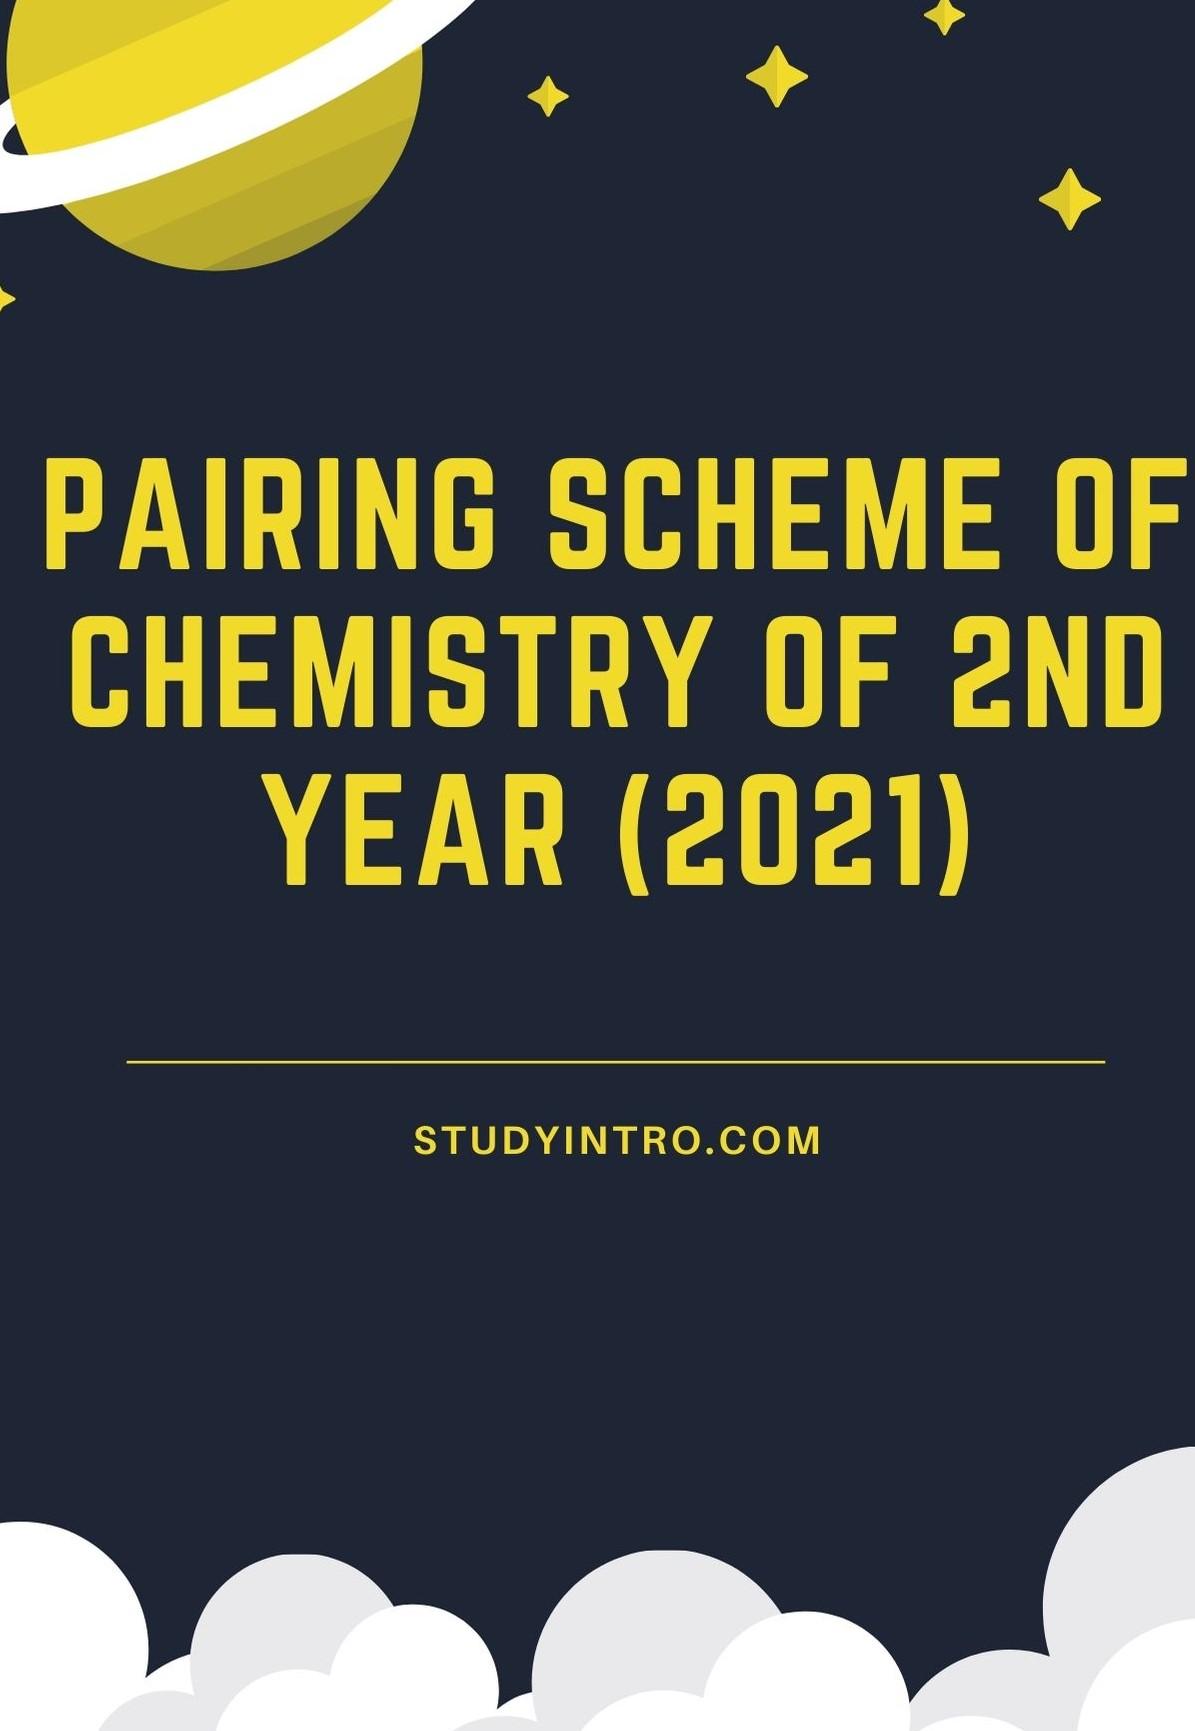 Pairing Scheme of Chemistry